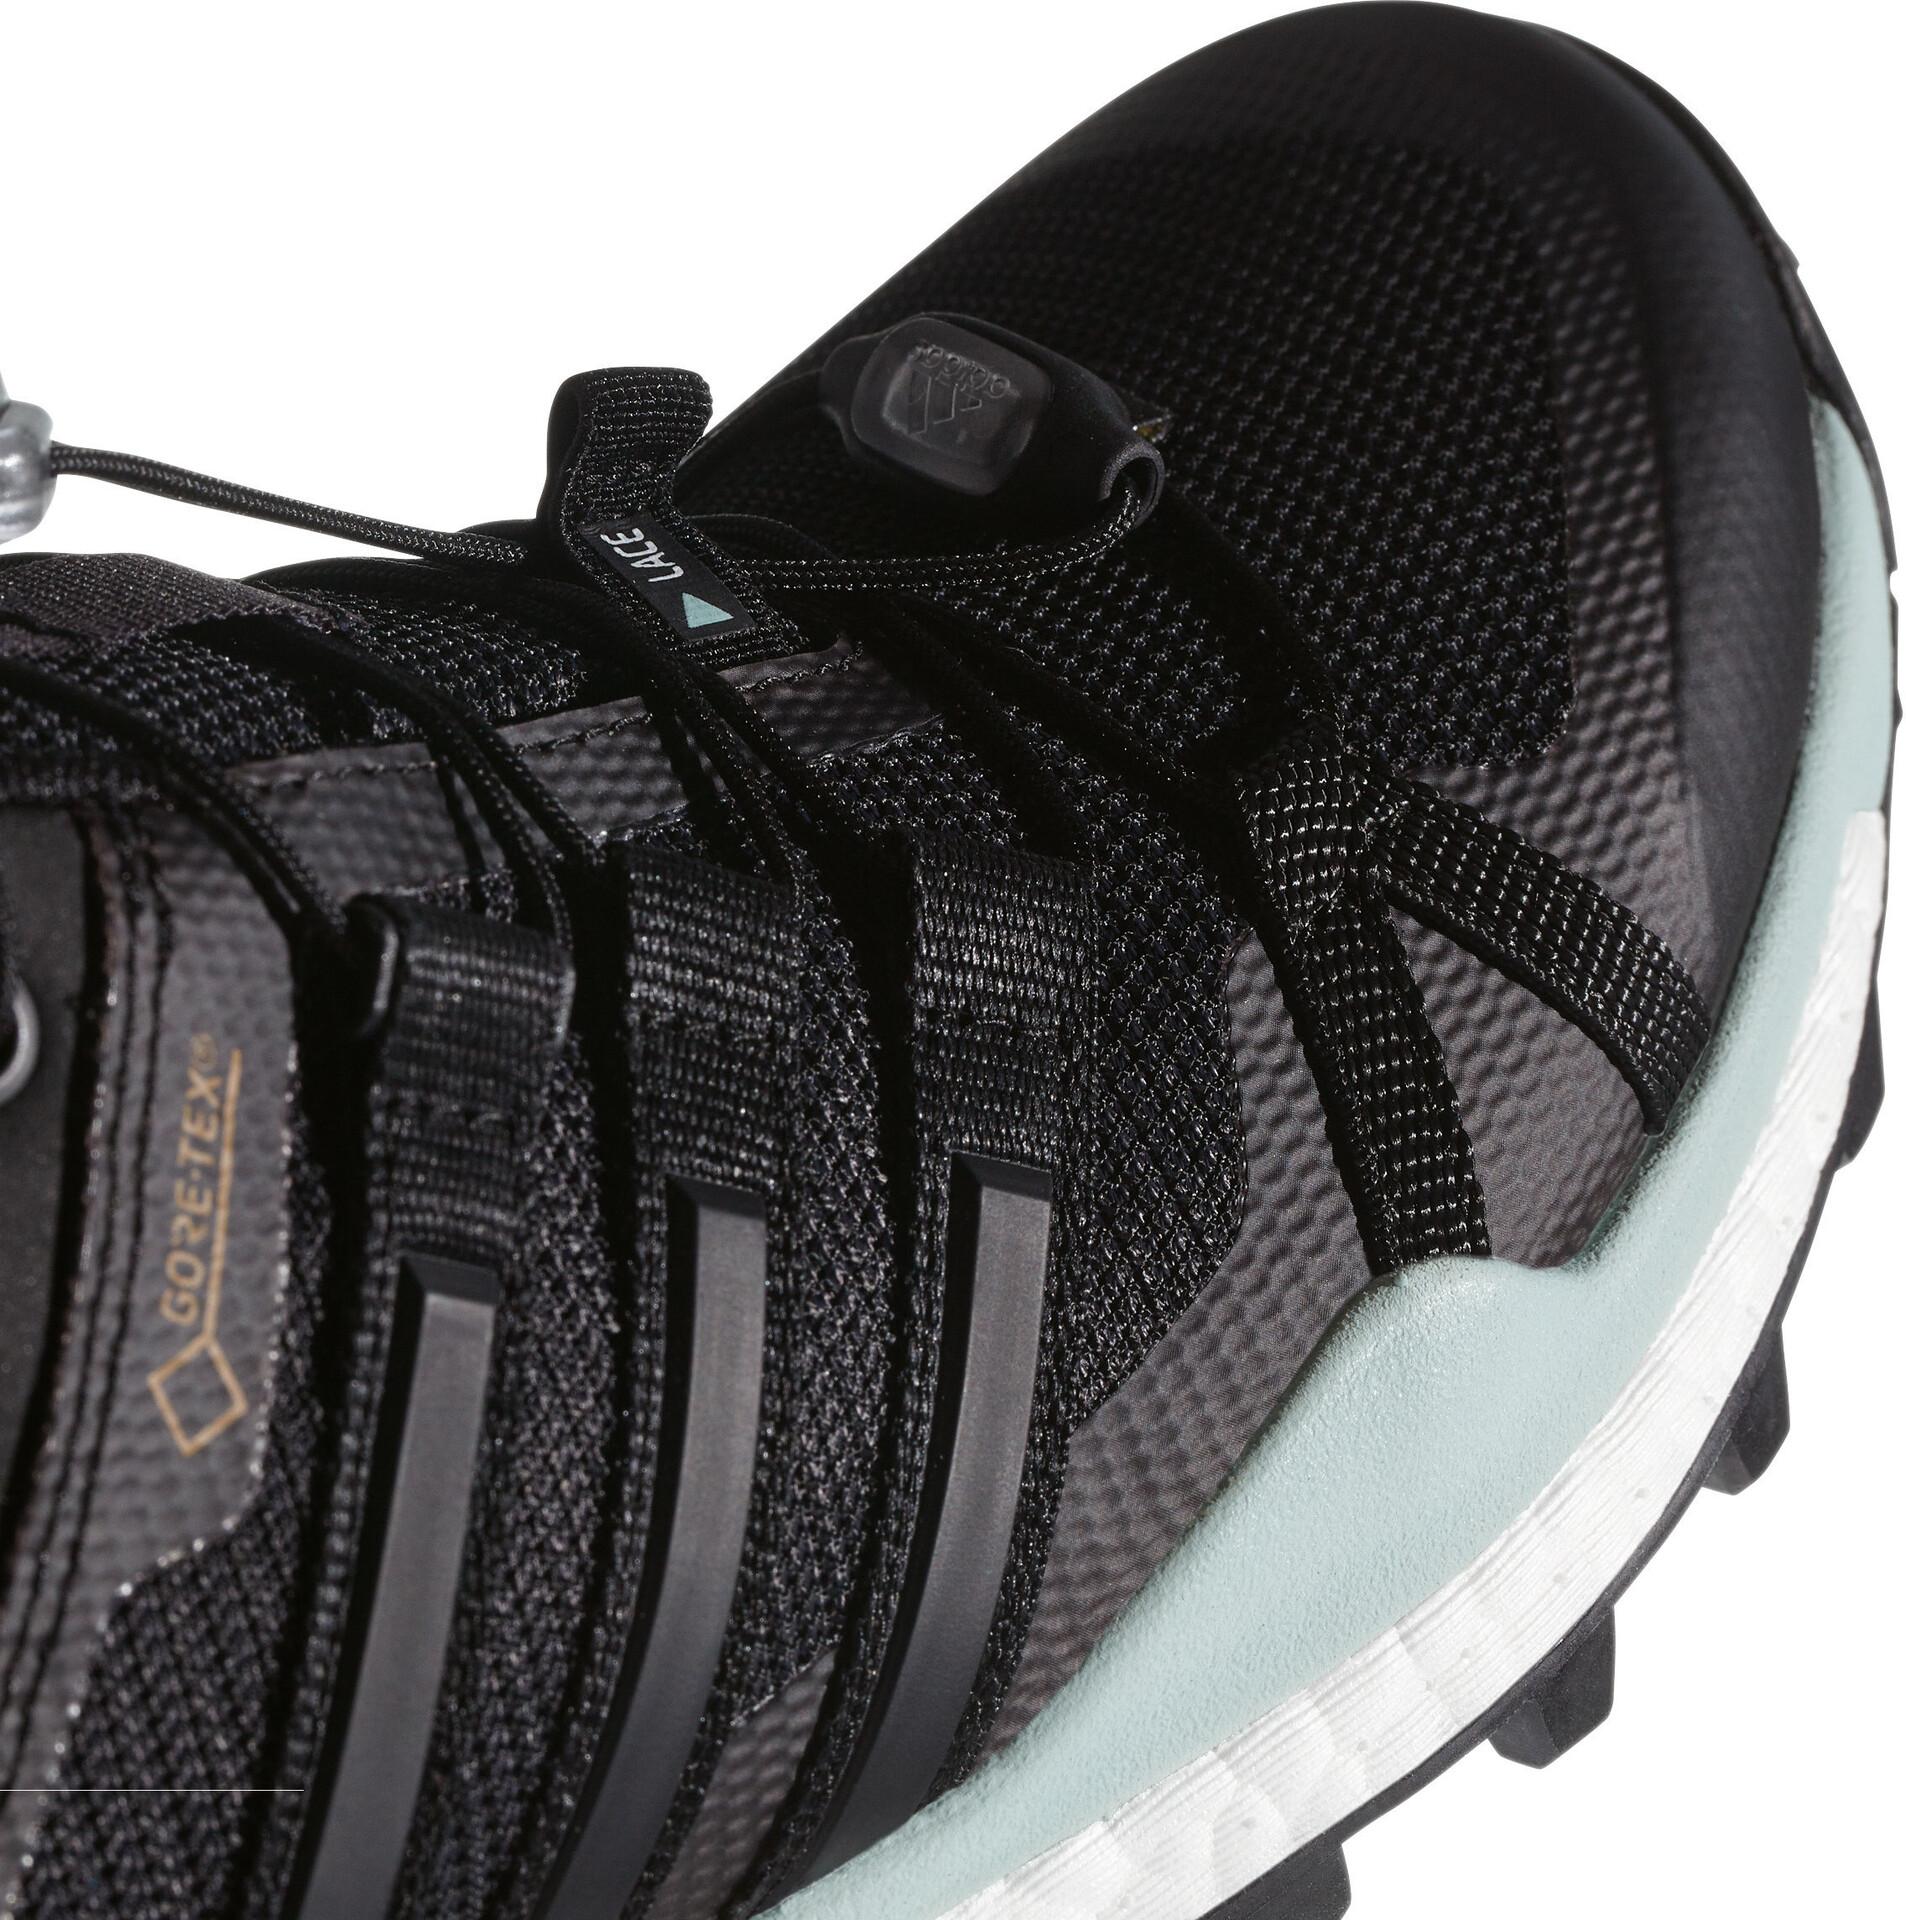 Adidas Noir Skychaser Chaussures Femme Gt Terrex Running Sur 1KcTFJl3